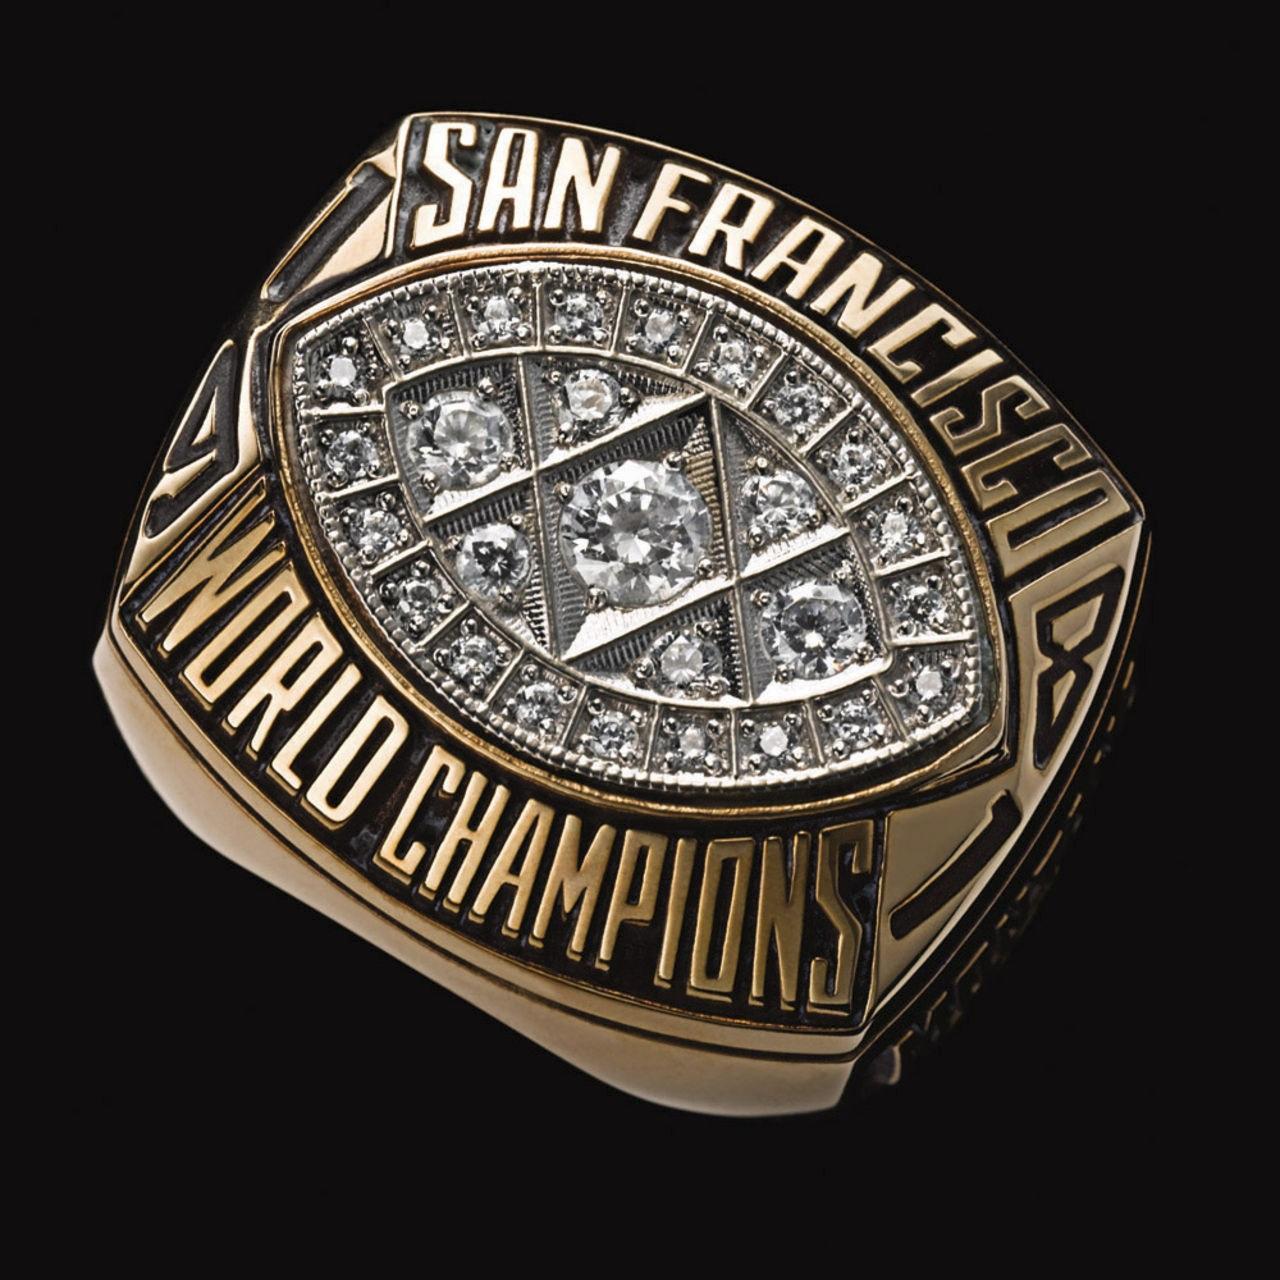 San Francisco 49ers 1982 champions ring